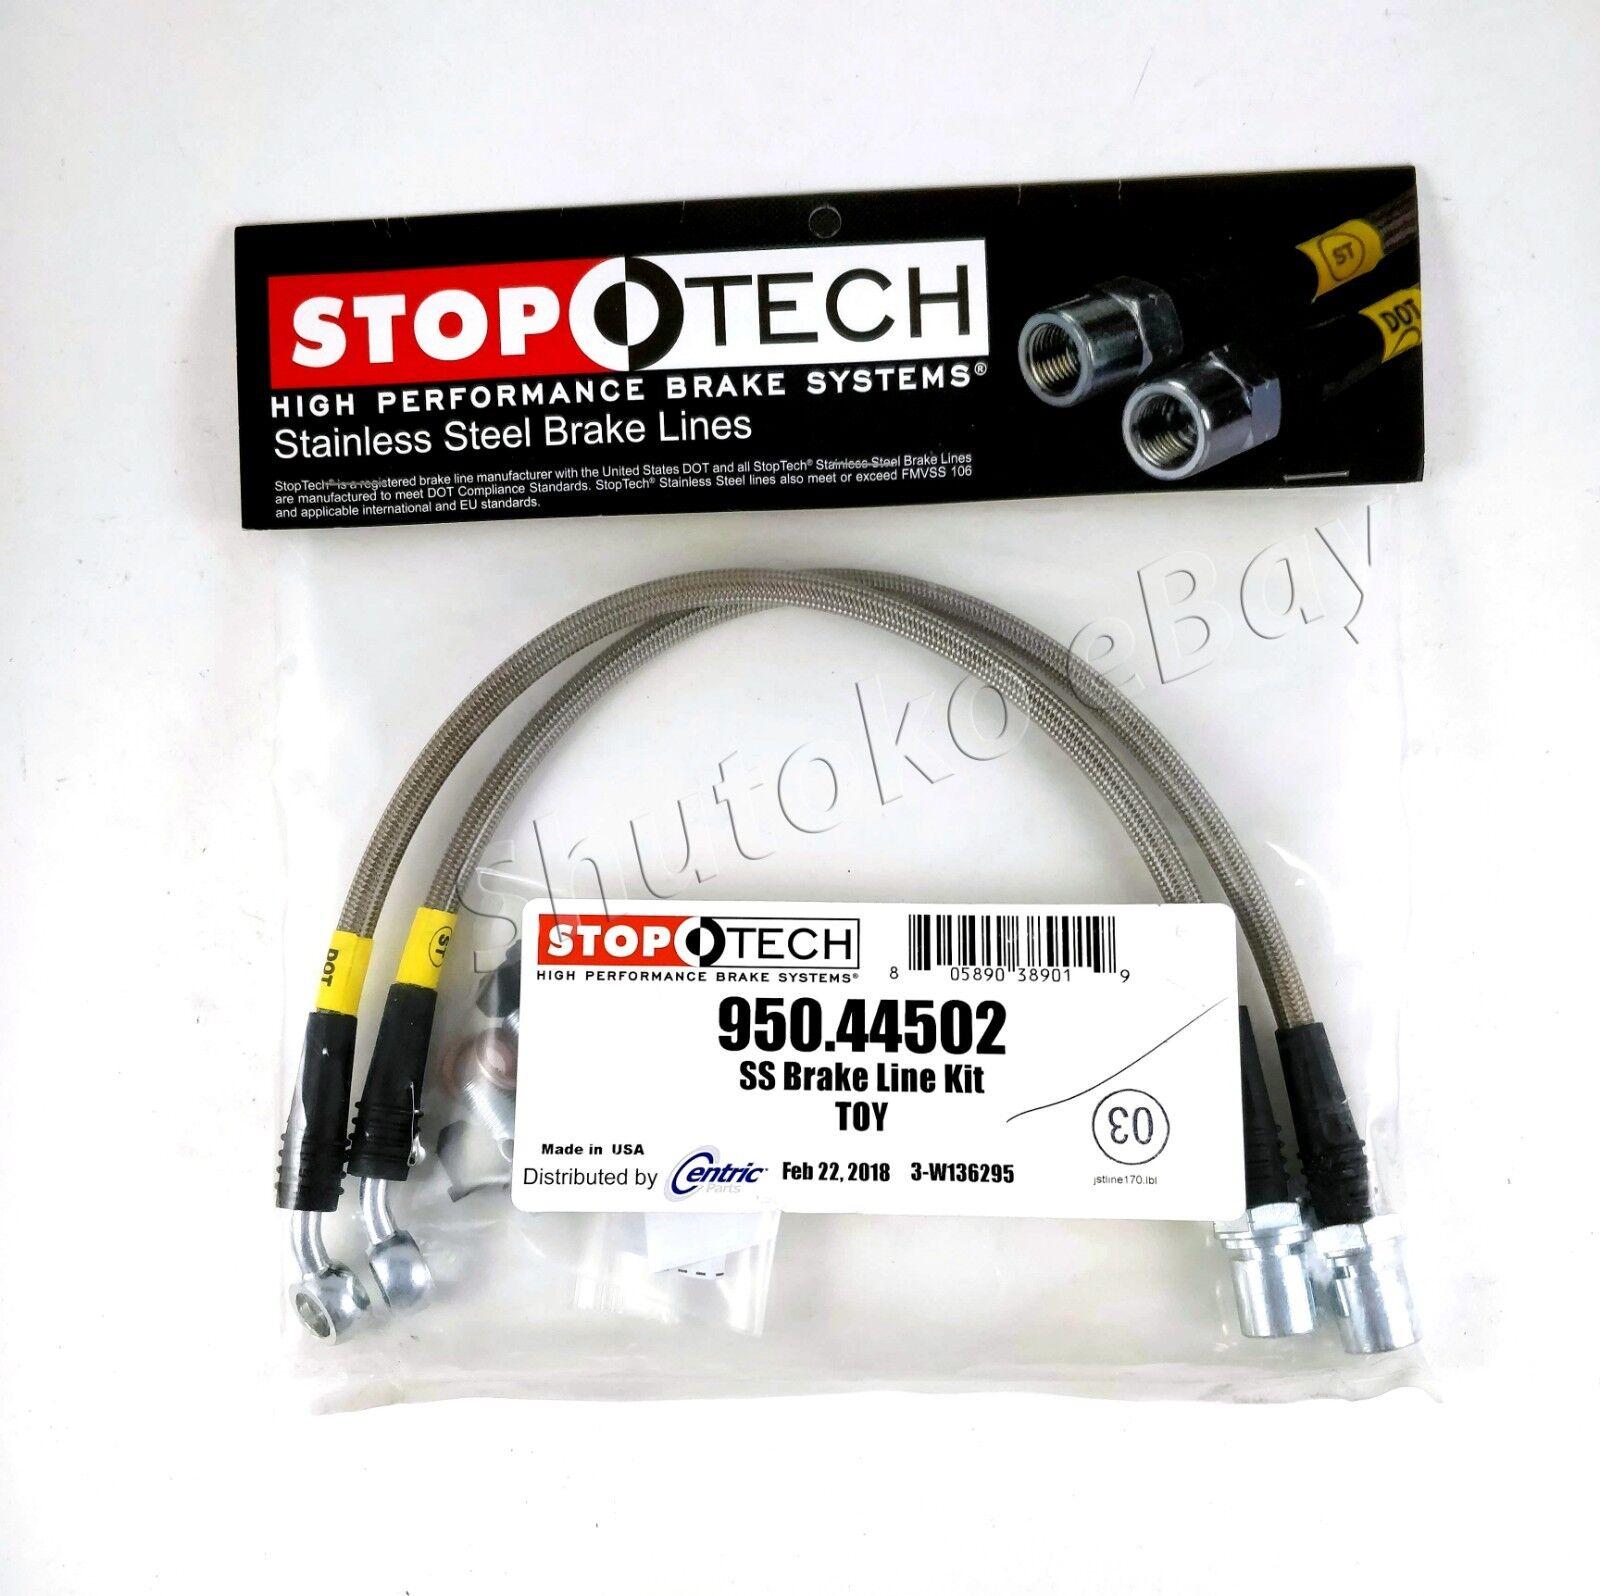 950.35001 StopTech Stainless Steel Brake Line Kit